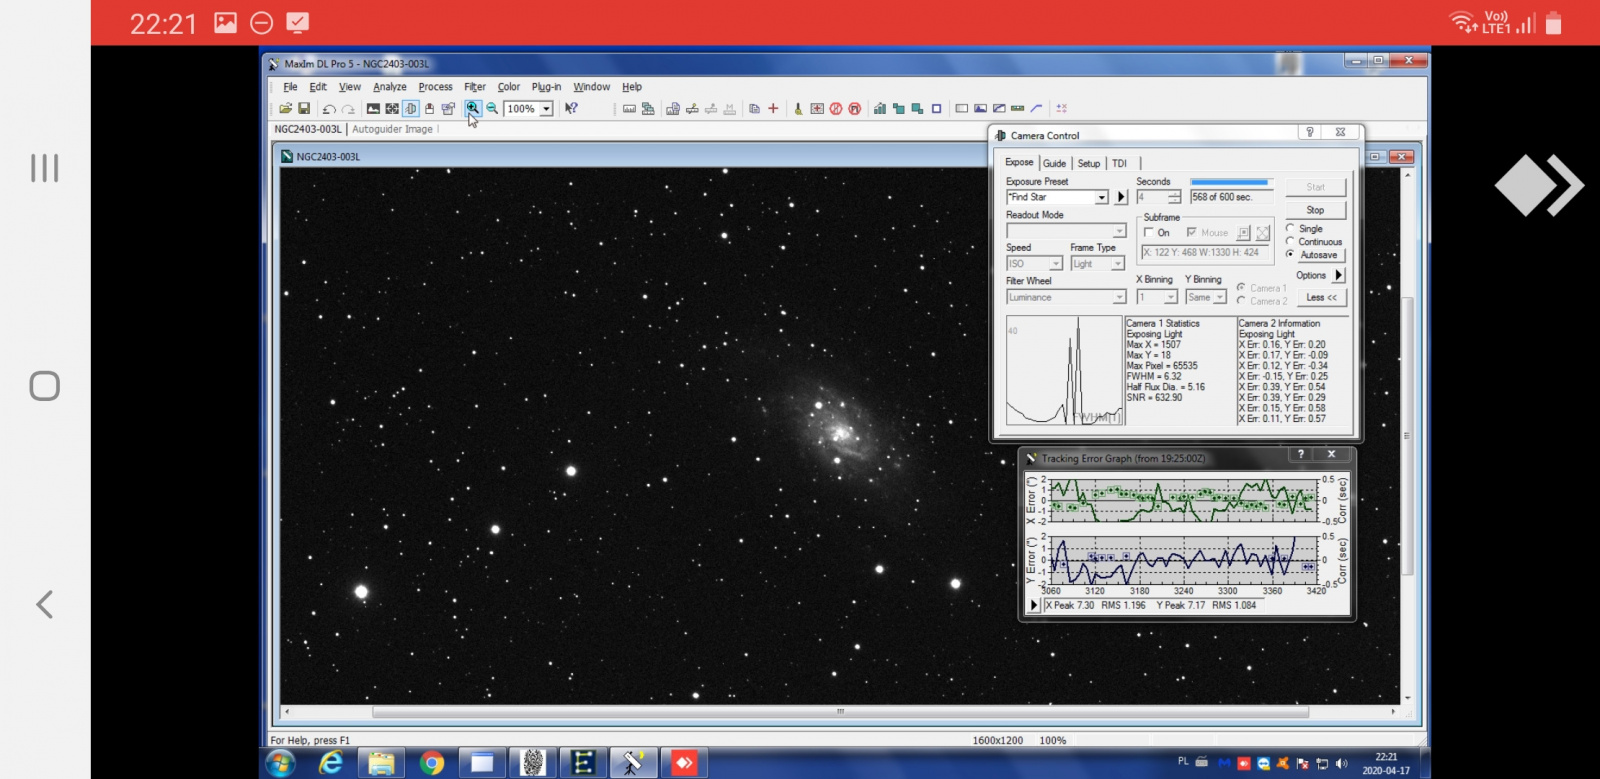 Screenshot_20200417-222159_AnyDesk.thumb.jpg.debc590dd4ddec05f0760c332c07c86e.jpg